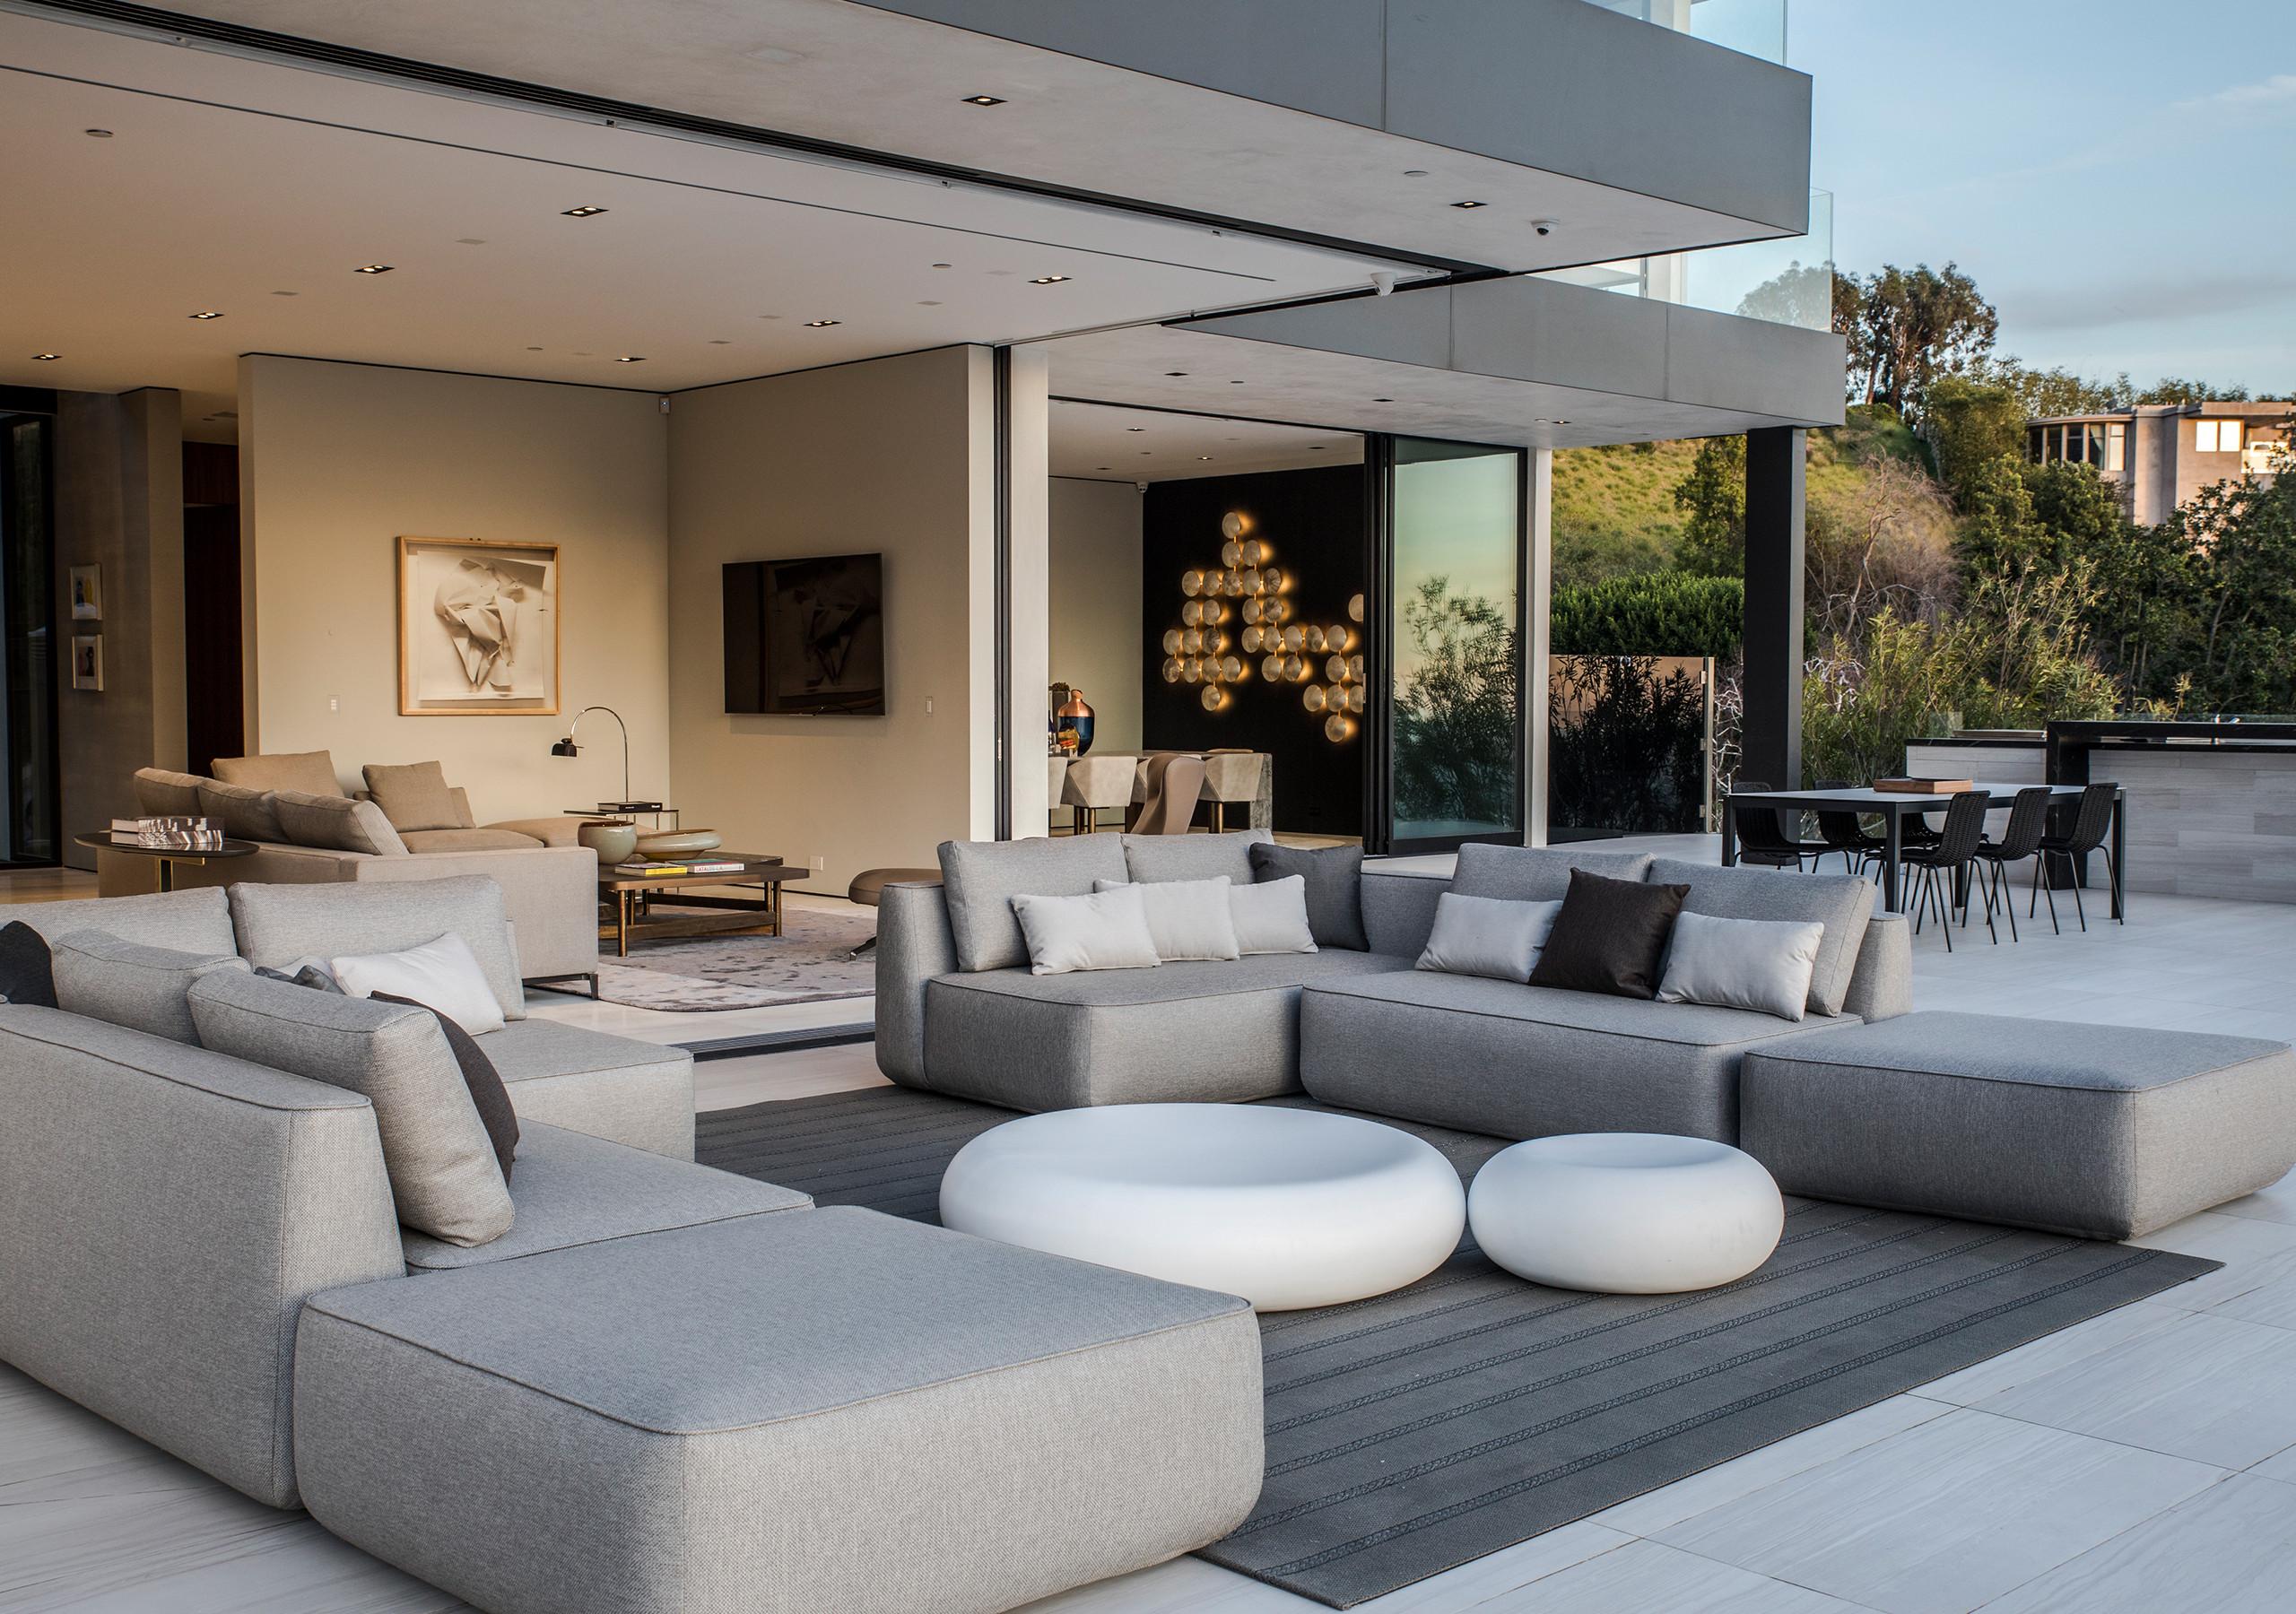 Expormim-USA-California (West Hollywood)-Doheny Residence-Plump ottoman-C879